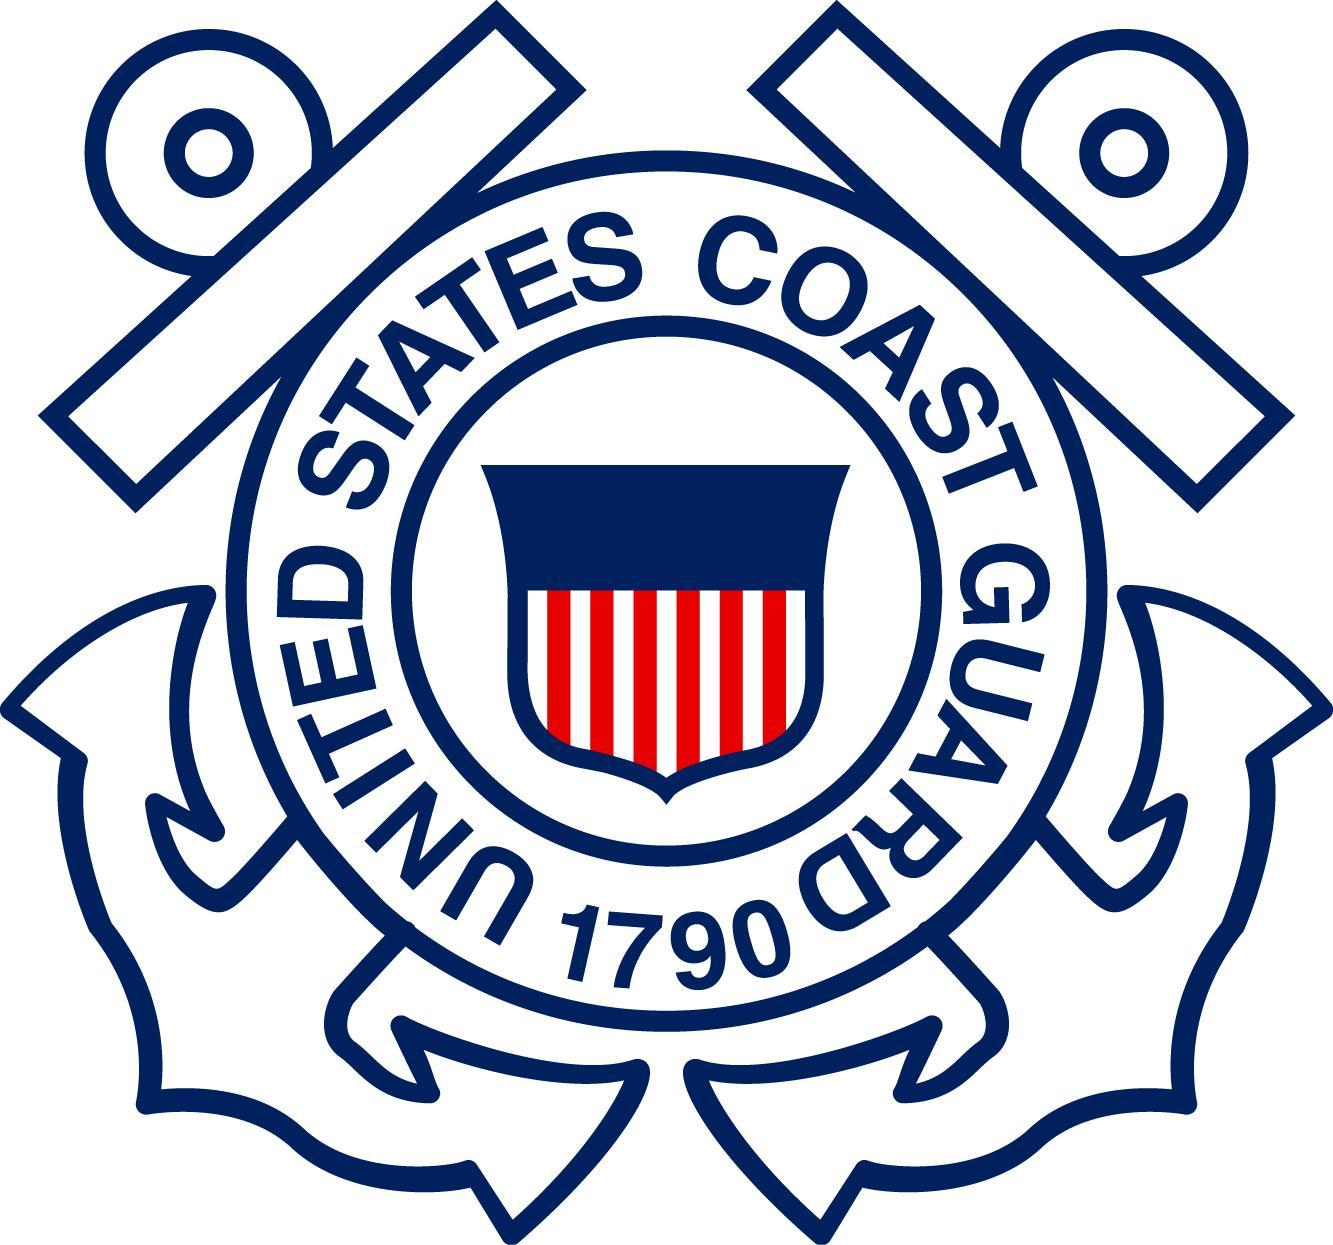 Death Of Coast Guard Member Sparks Investigation In Unalaska | KUCB